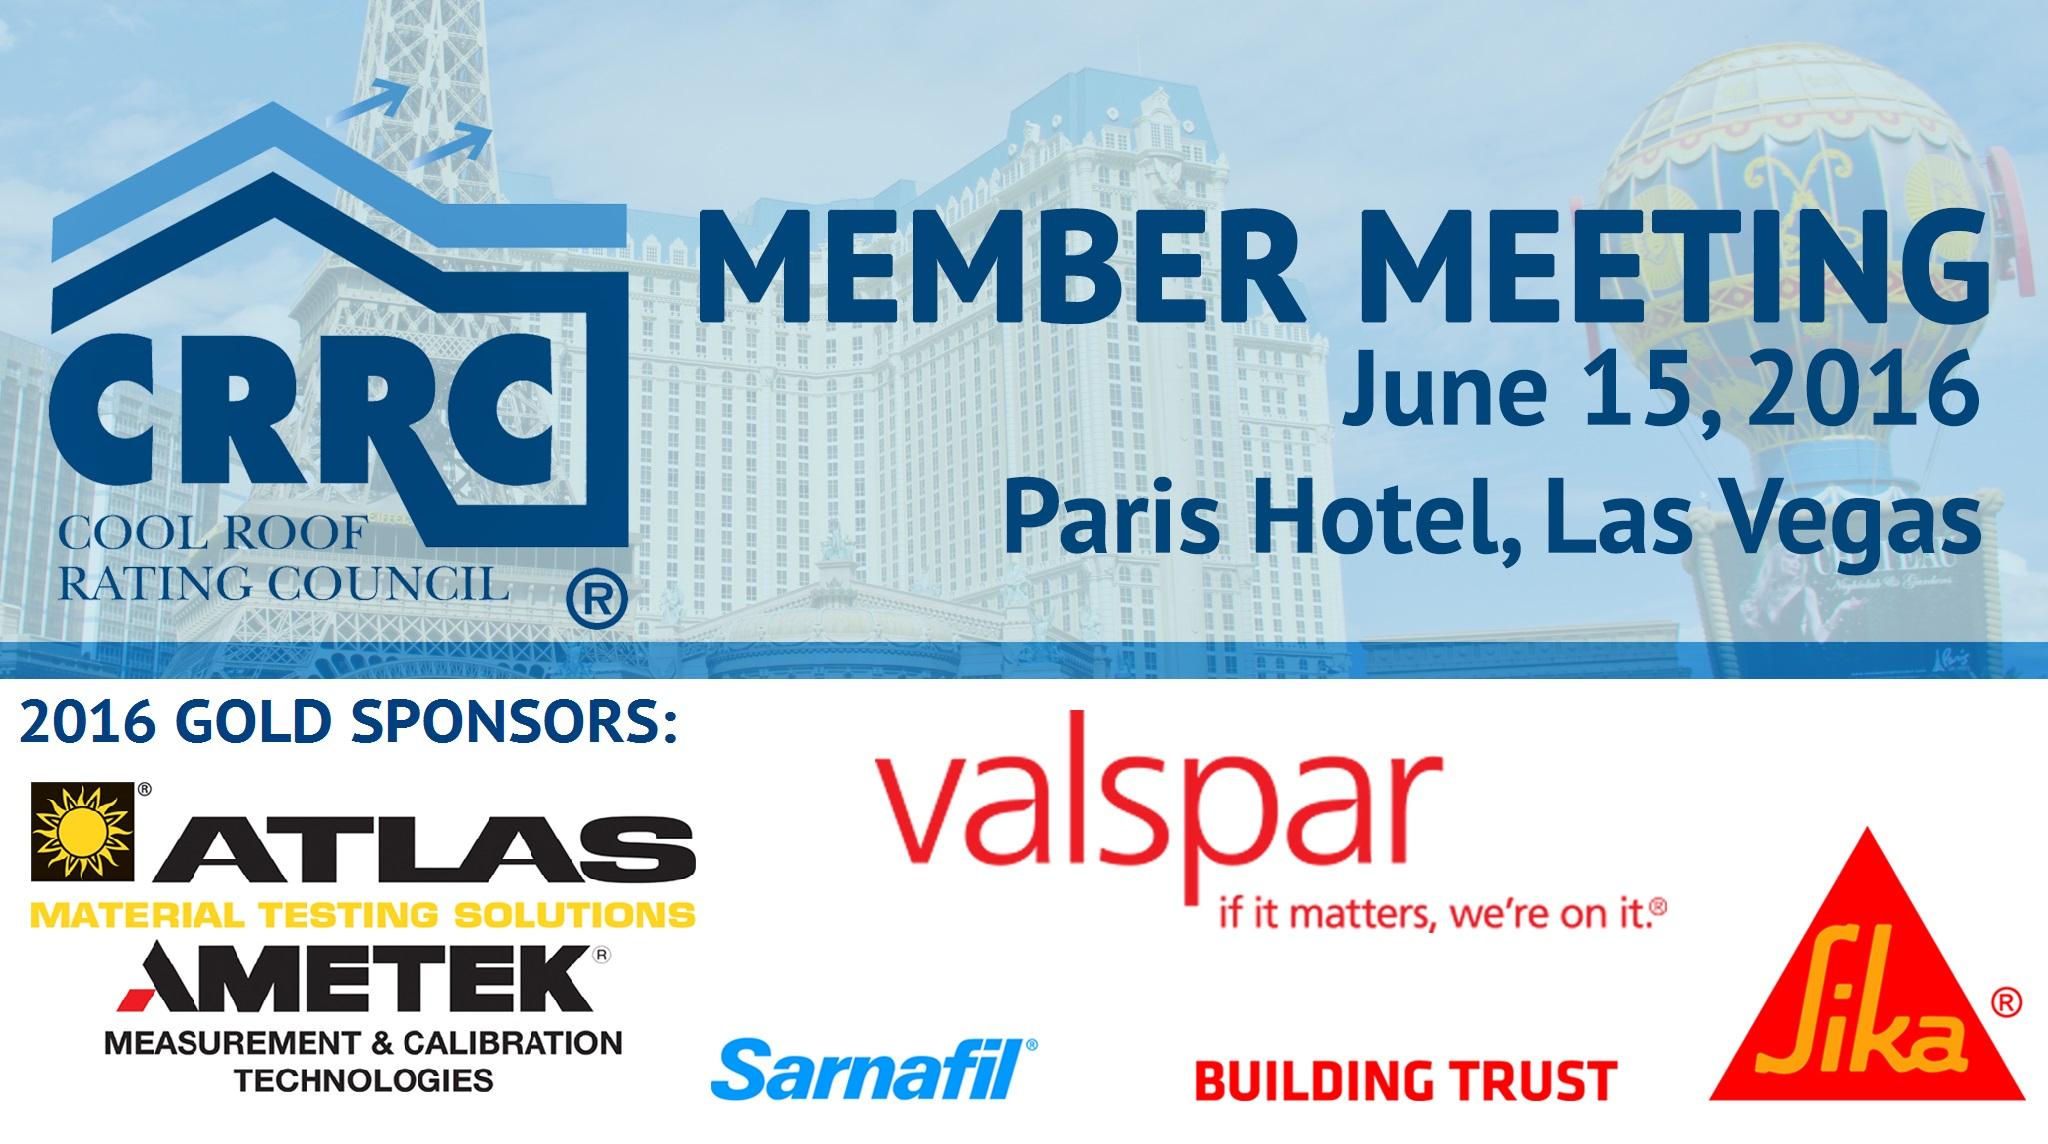 2016 Member Meeting, Gold Sponsors: Atlas Material Testing Technology, LLC; Sika Corporation; and Valspar Corporation.